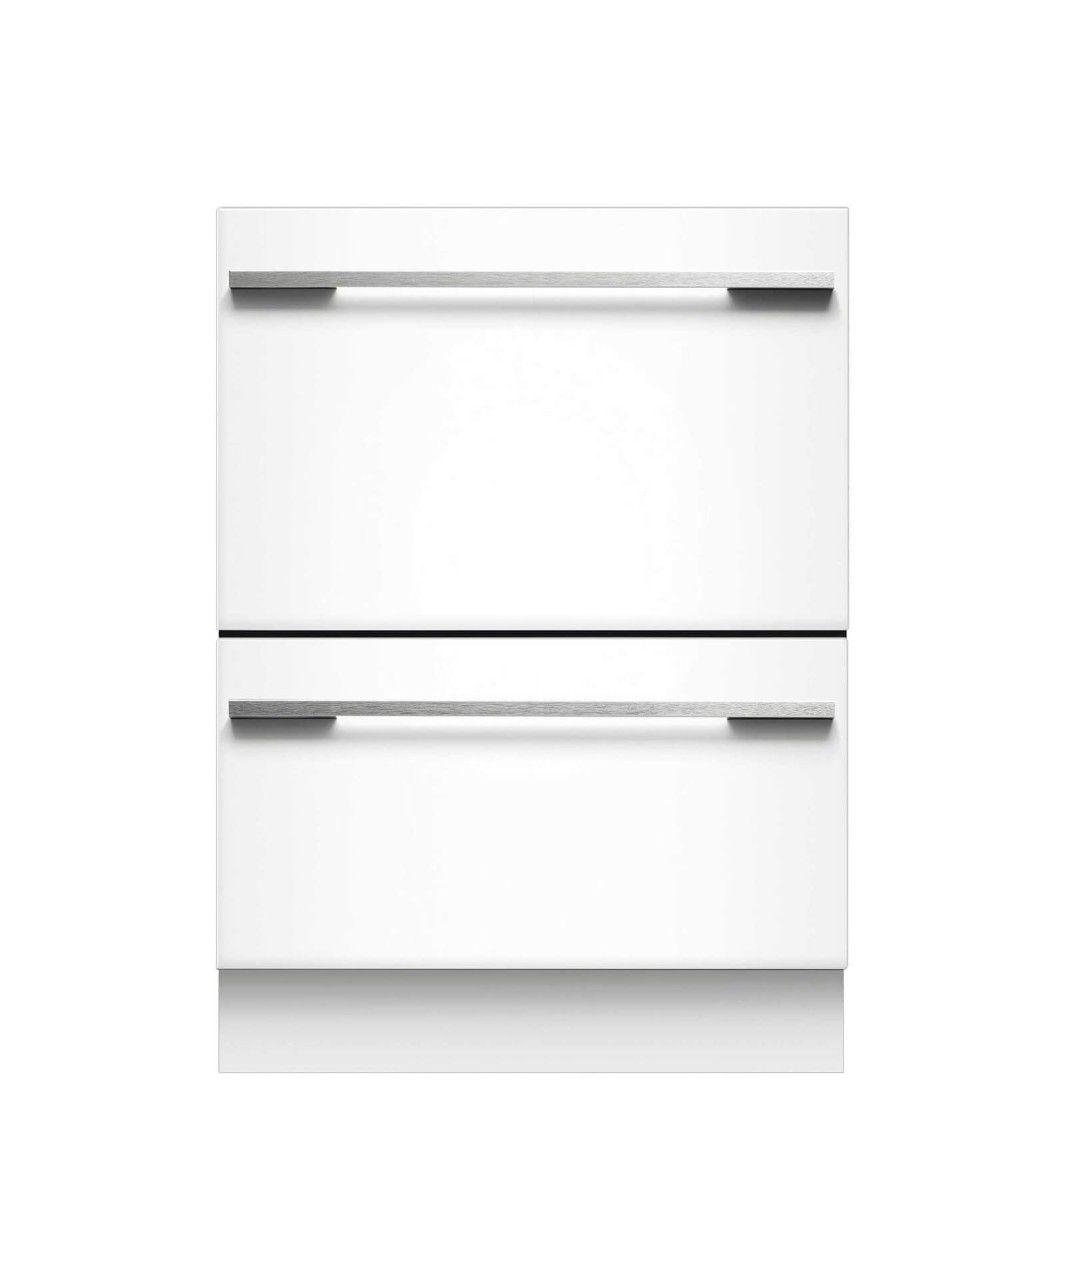 Dd24di7 Dishdrawer Double Dishwasher Drawer Dishwasher Double Drawer Dishwasher Kitchen Design Styles